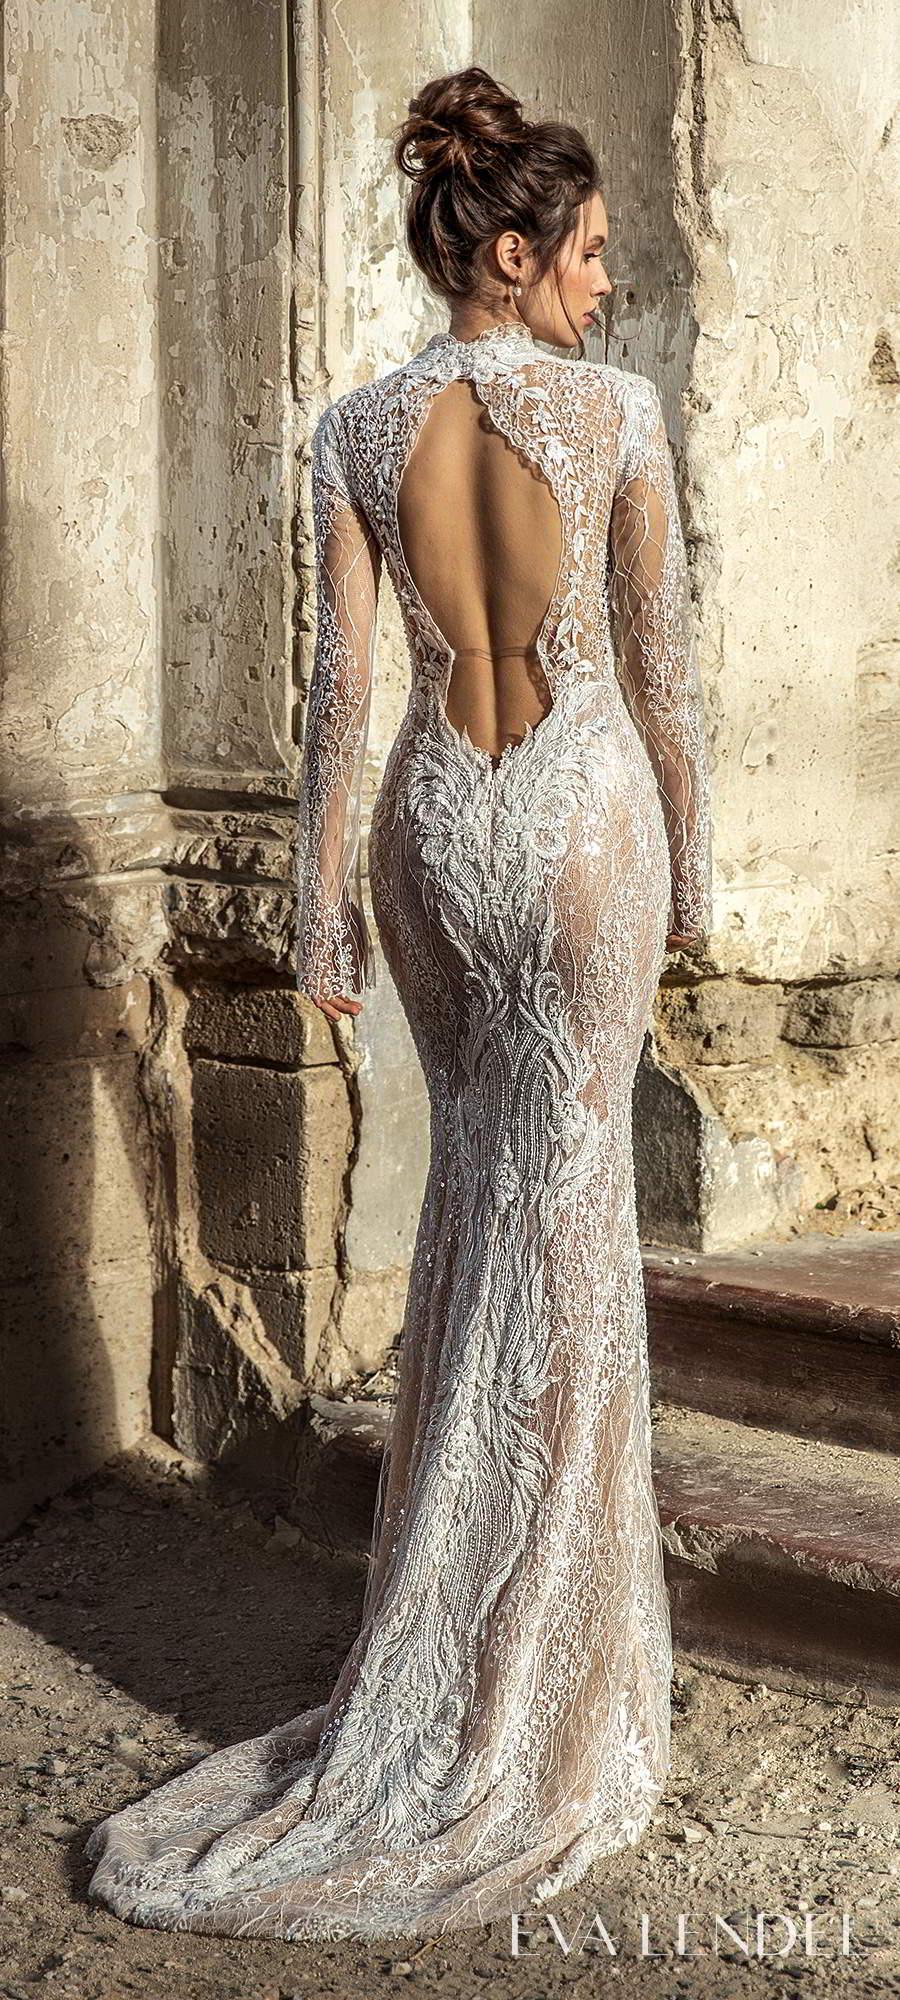 eva lendel 2021 golden hour bridal long sleeve high neckline fully embellished sheath wedding dress sweep train keyhole back (bredley) bv